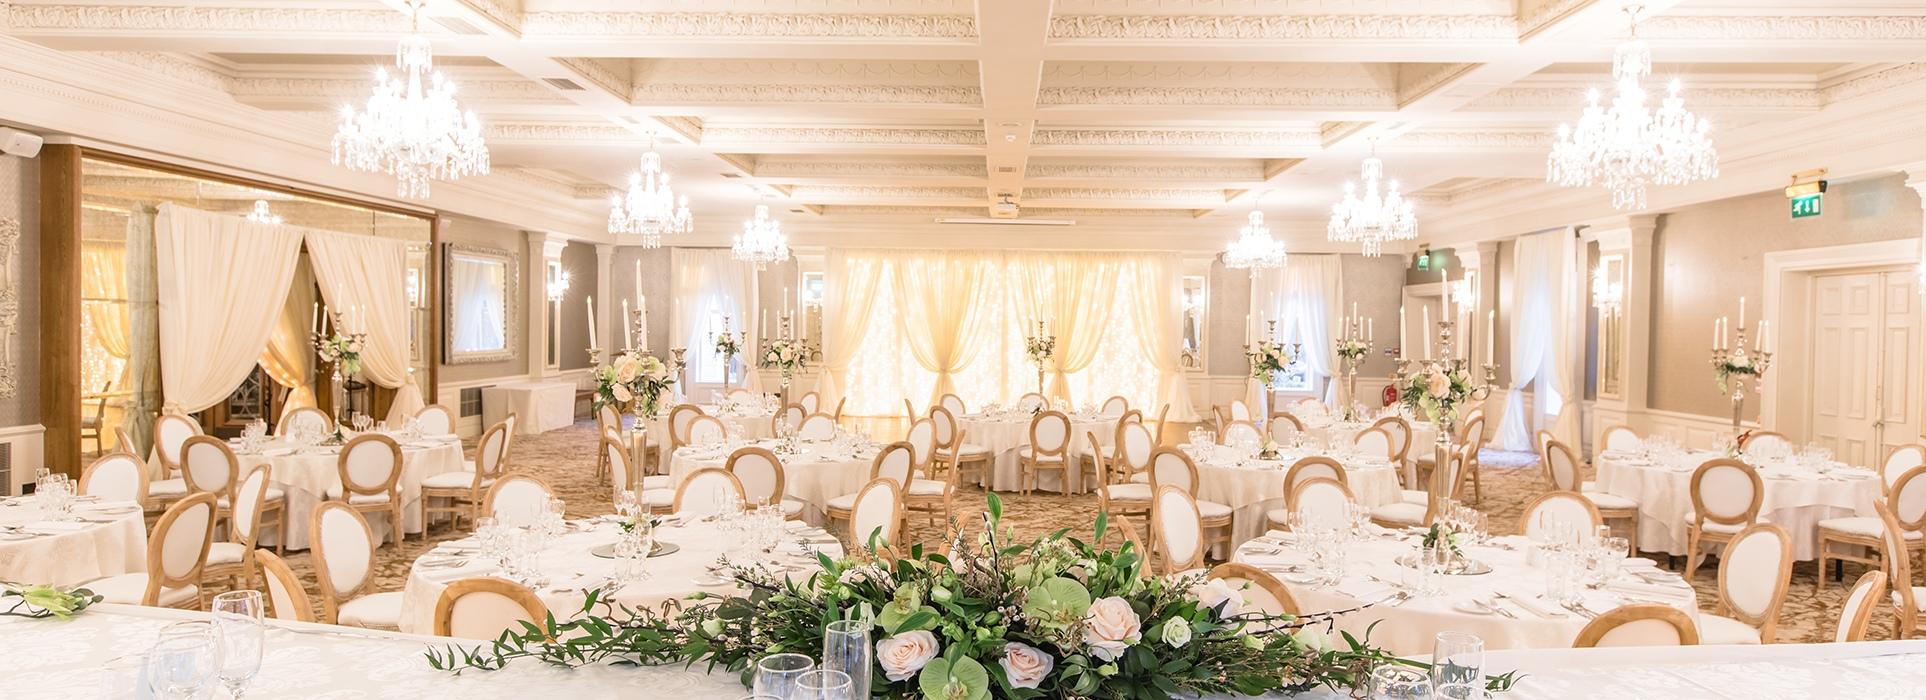 Great Hall Weddings